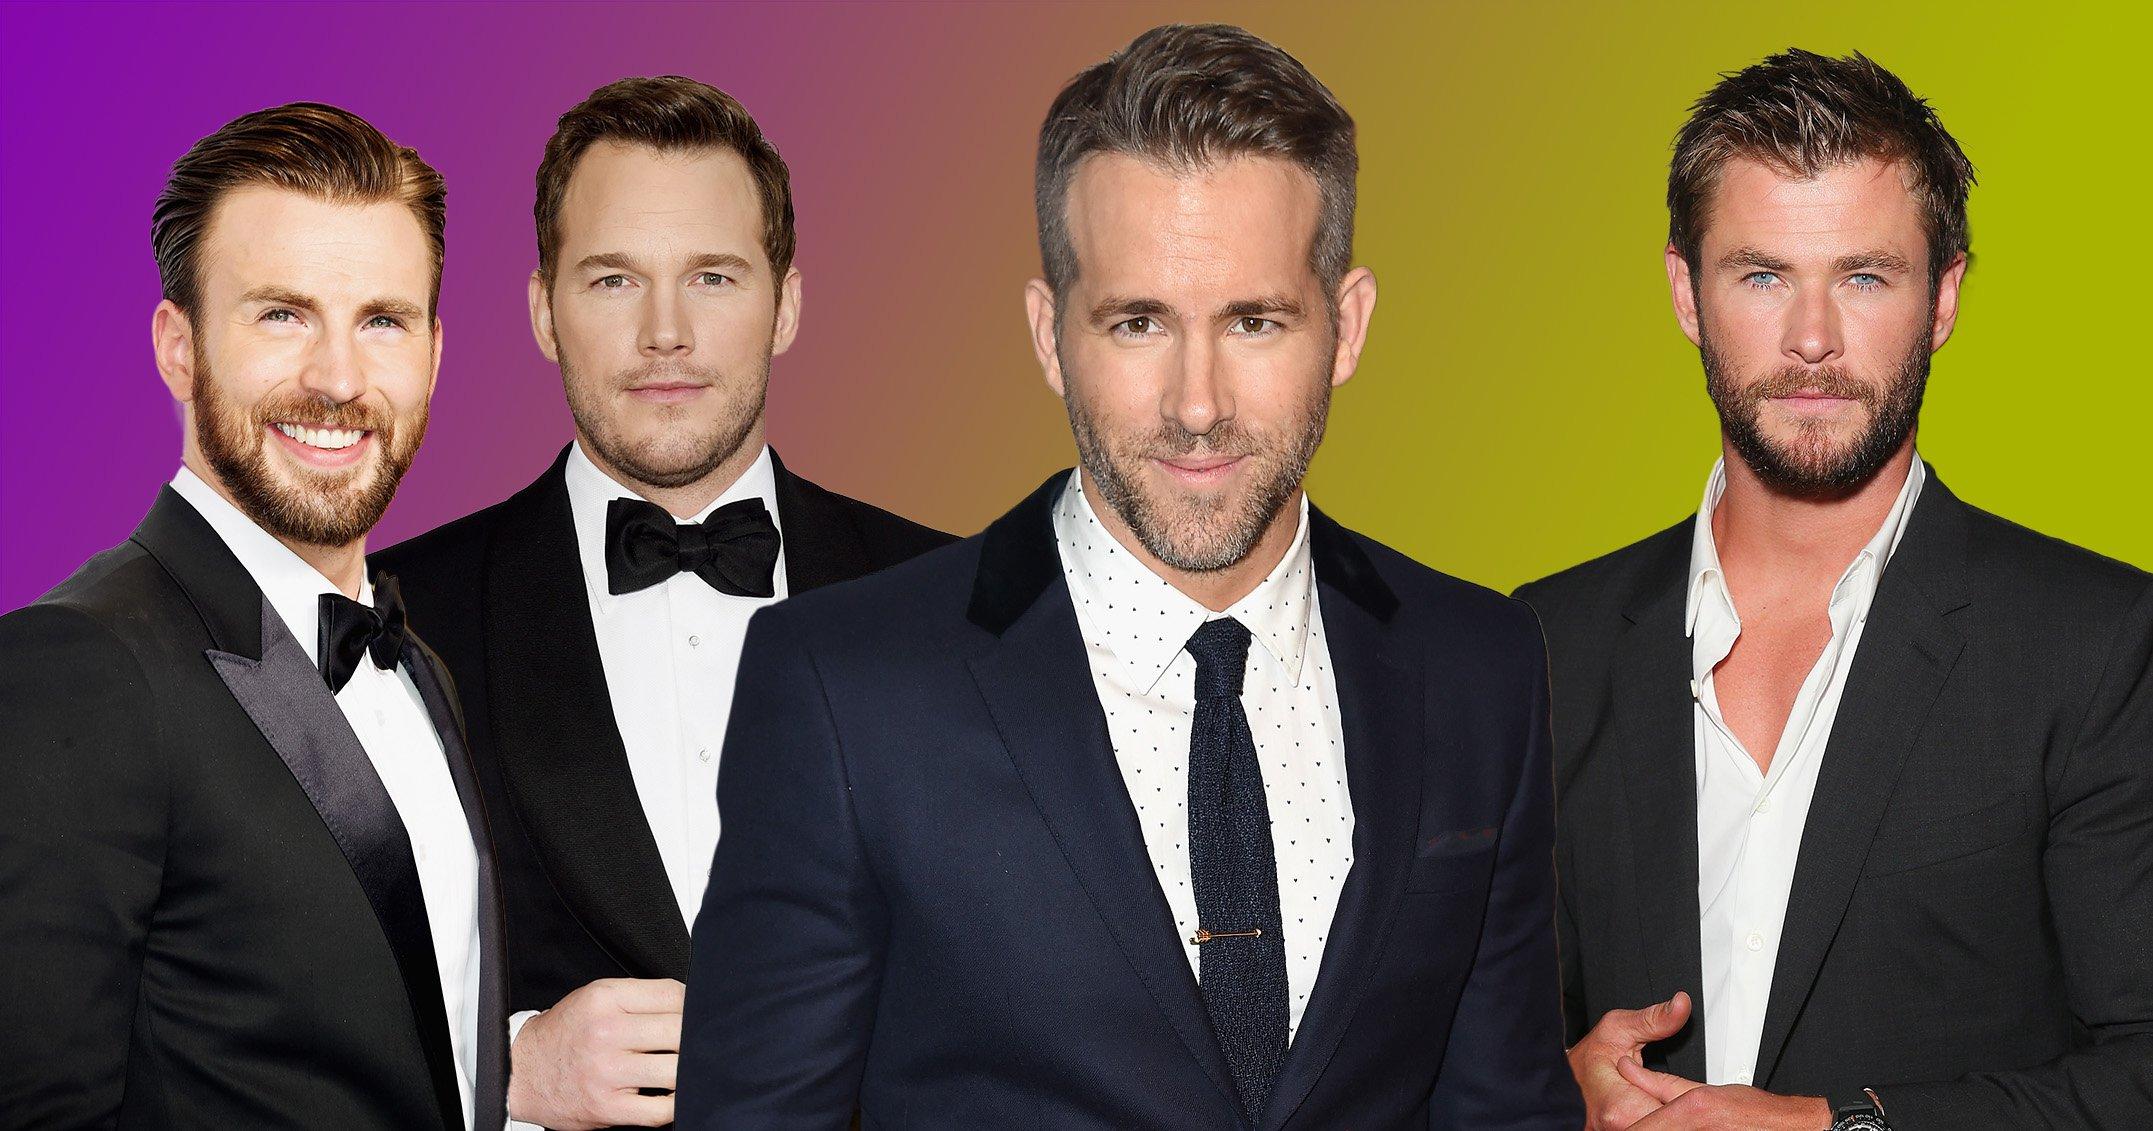 Ryan Reynolds wins Twitter (again) as he proclaims mancrush on Chris Hemsworth/Pratt/Evans